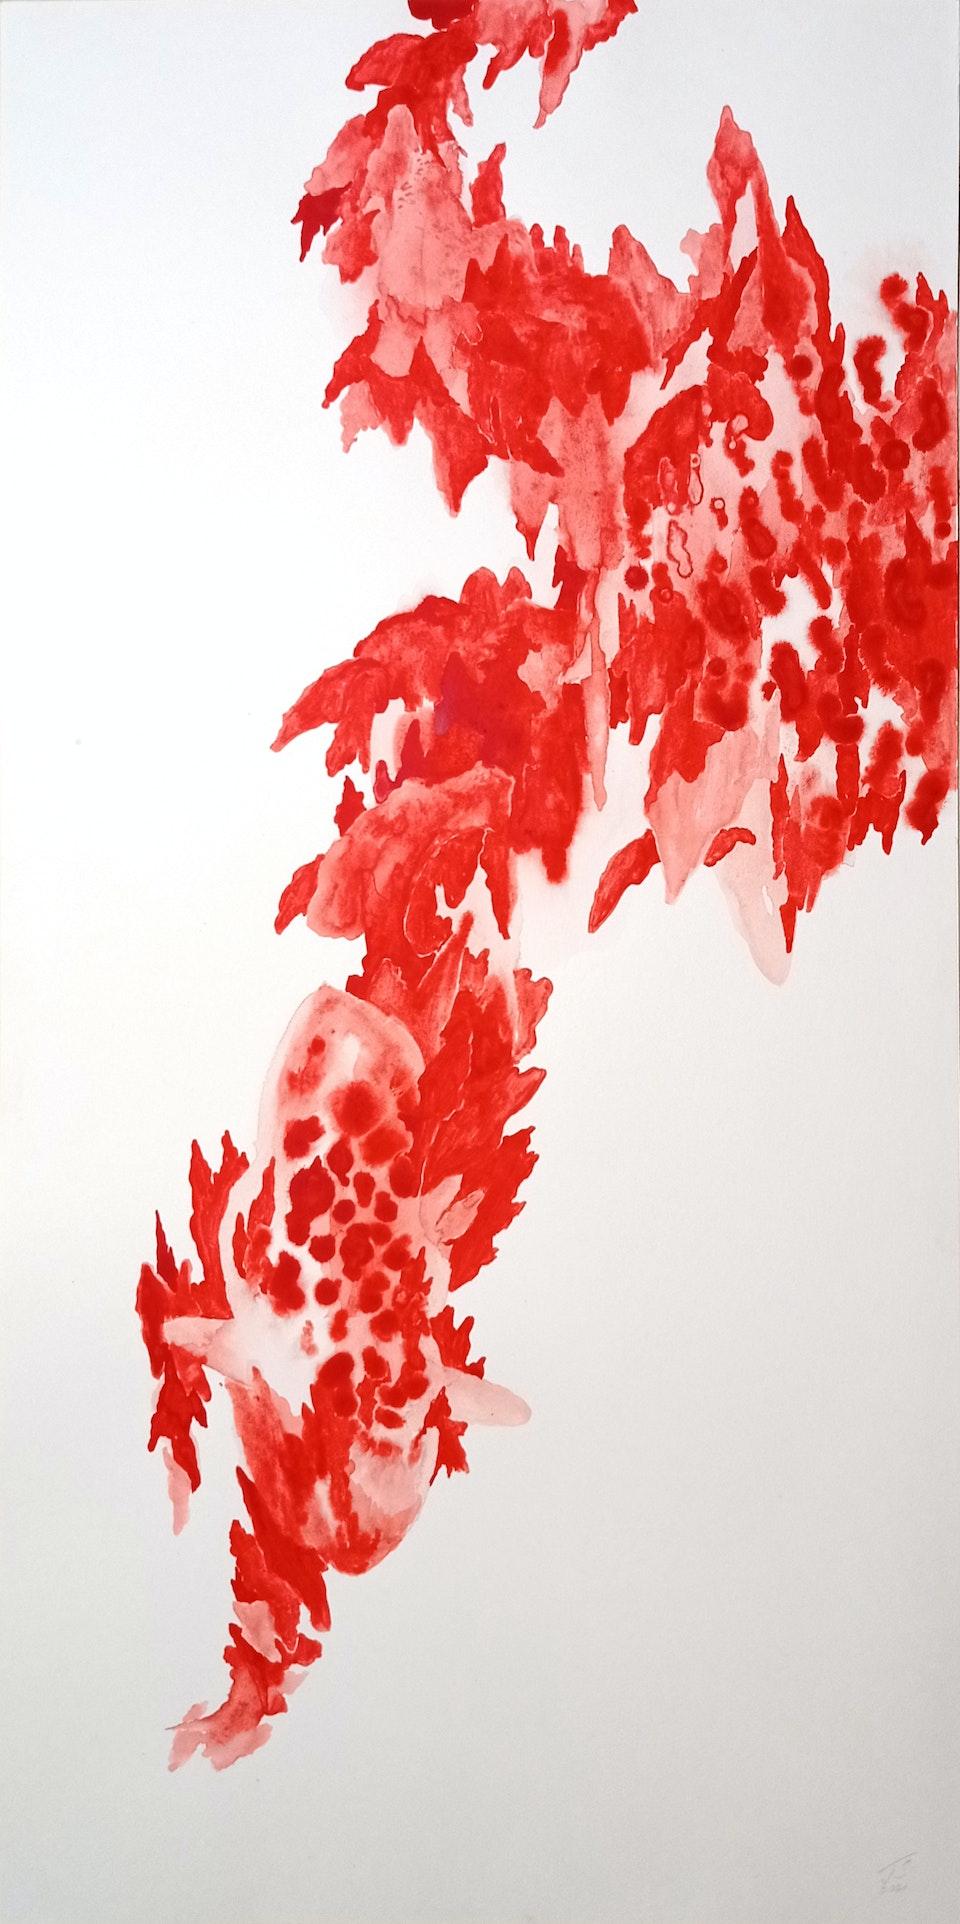 Roar_2021_Justin Southey - Justin Southey 2021 Roar Acrylic ink on paper 56cm x 28cm  ZAR 14 500